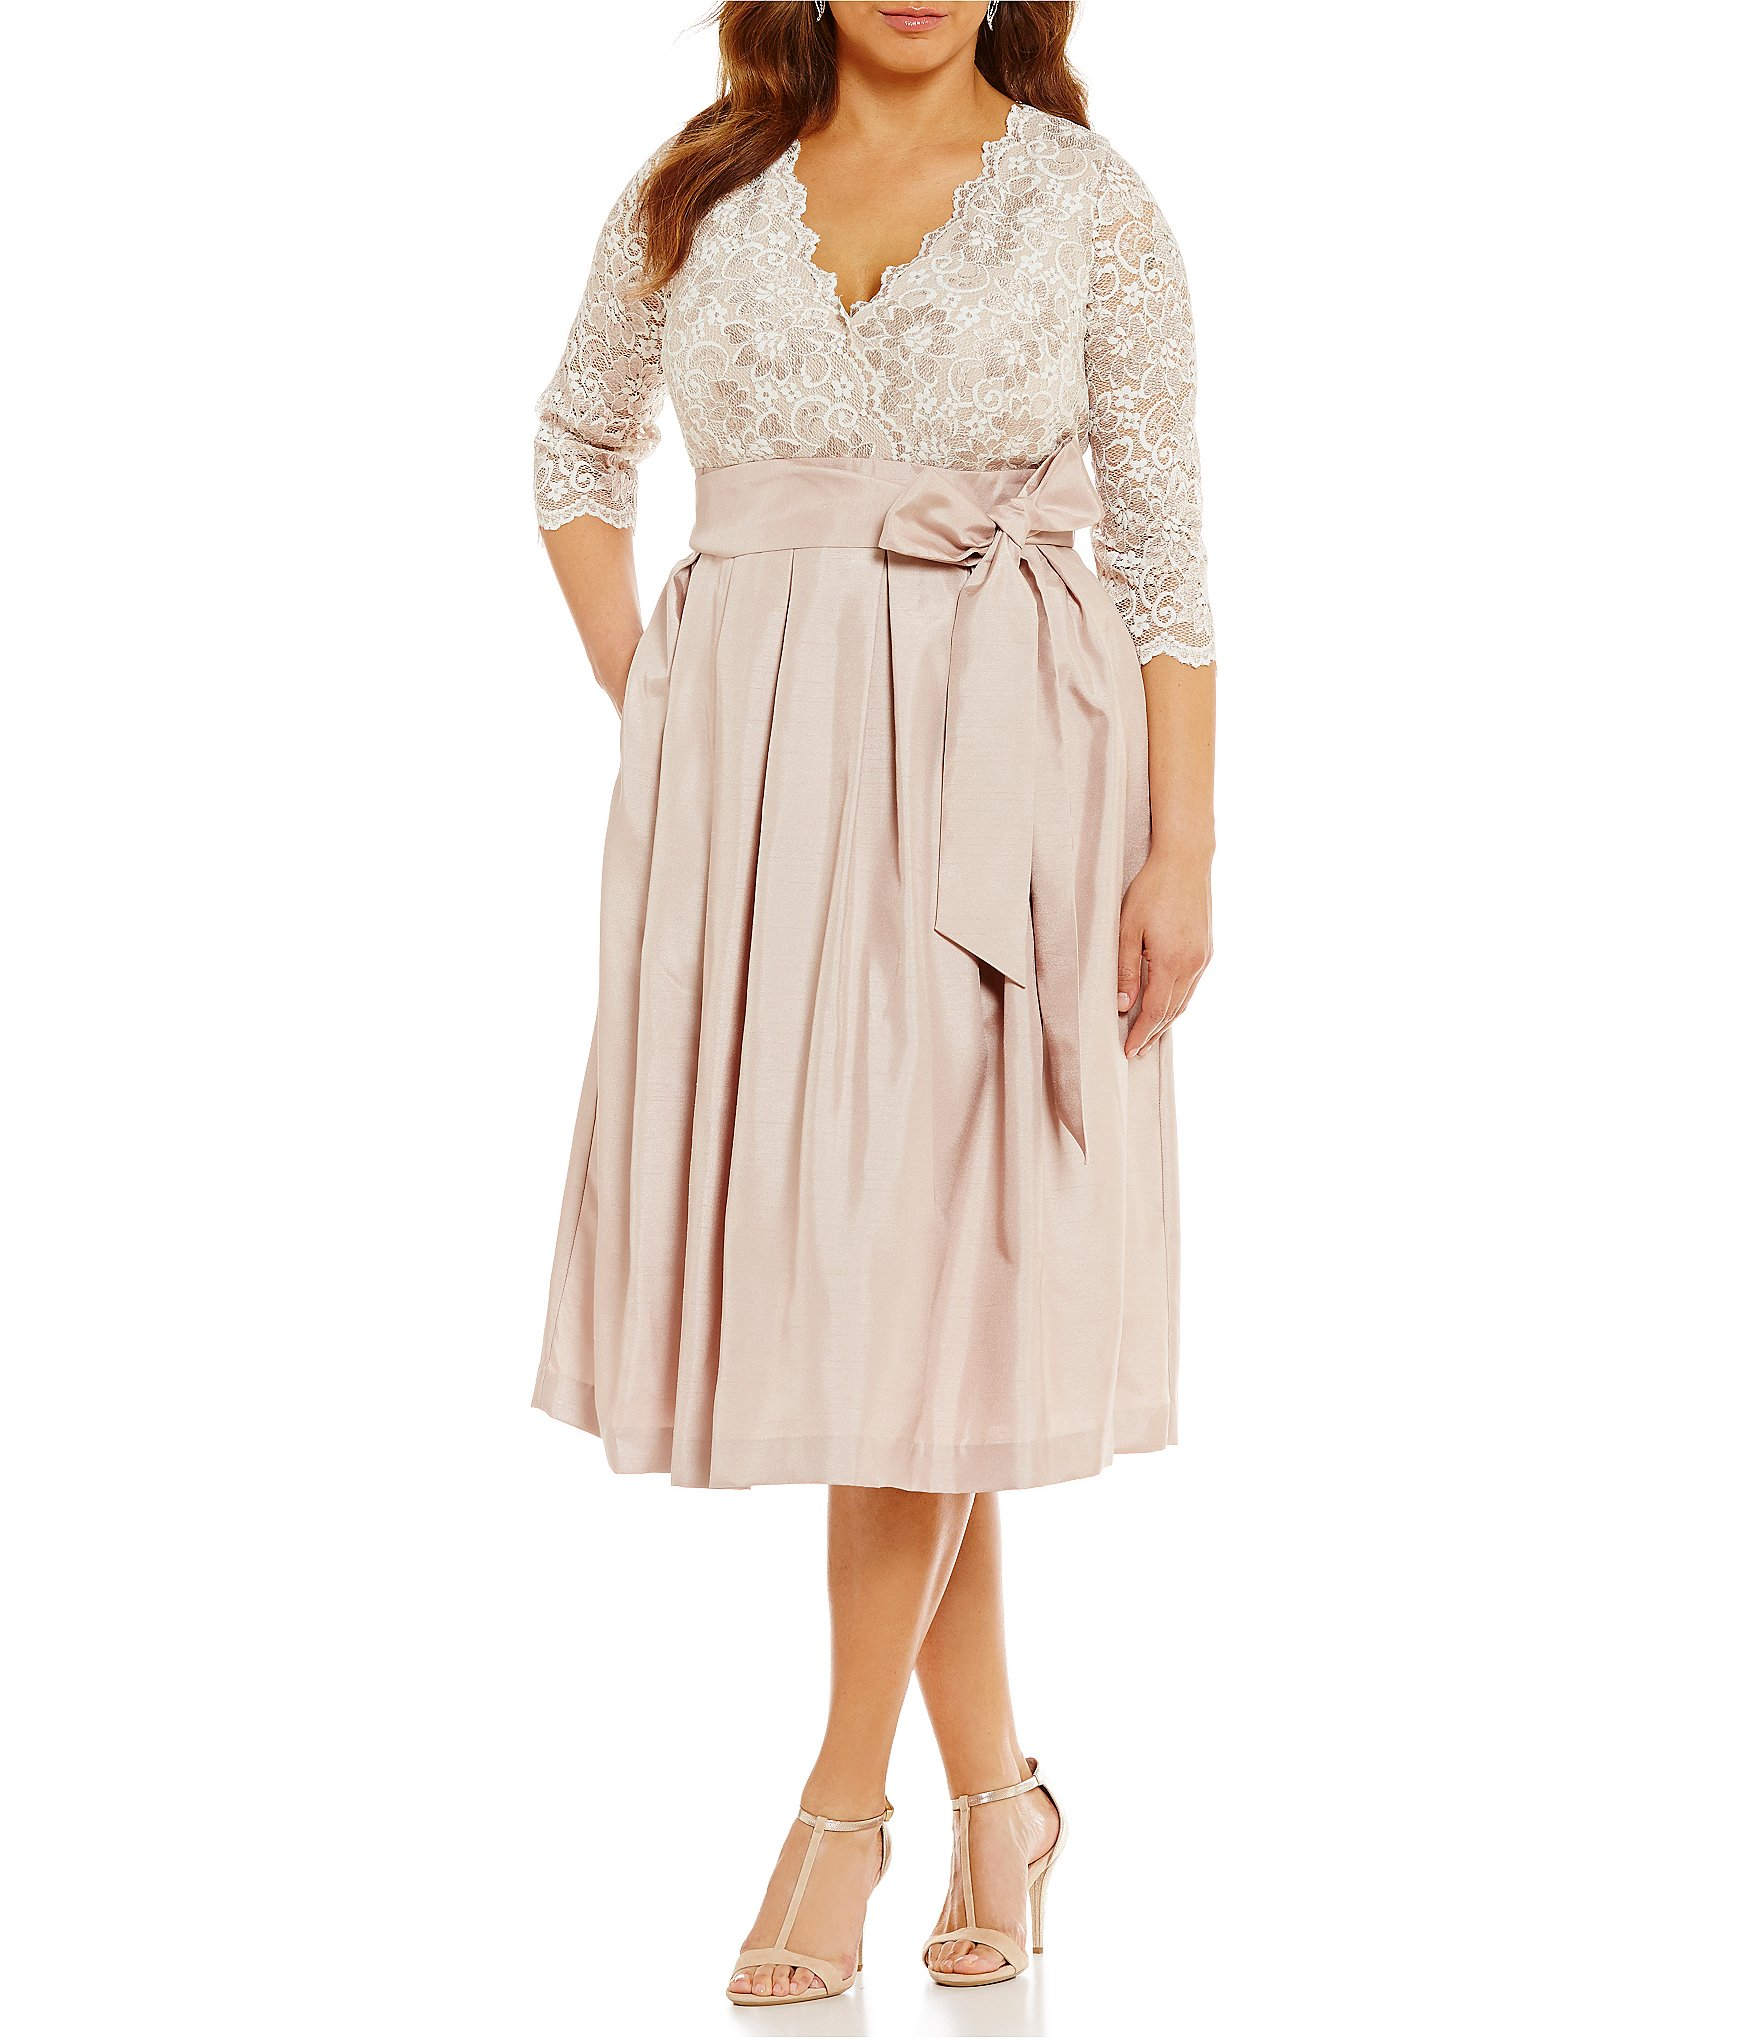 dillards elegant dresses photo - 1